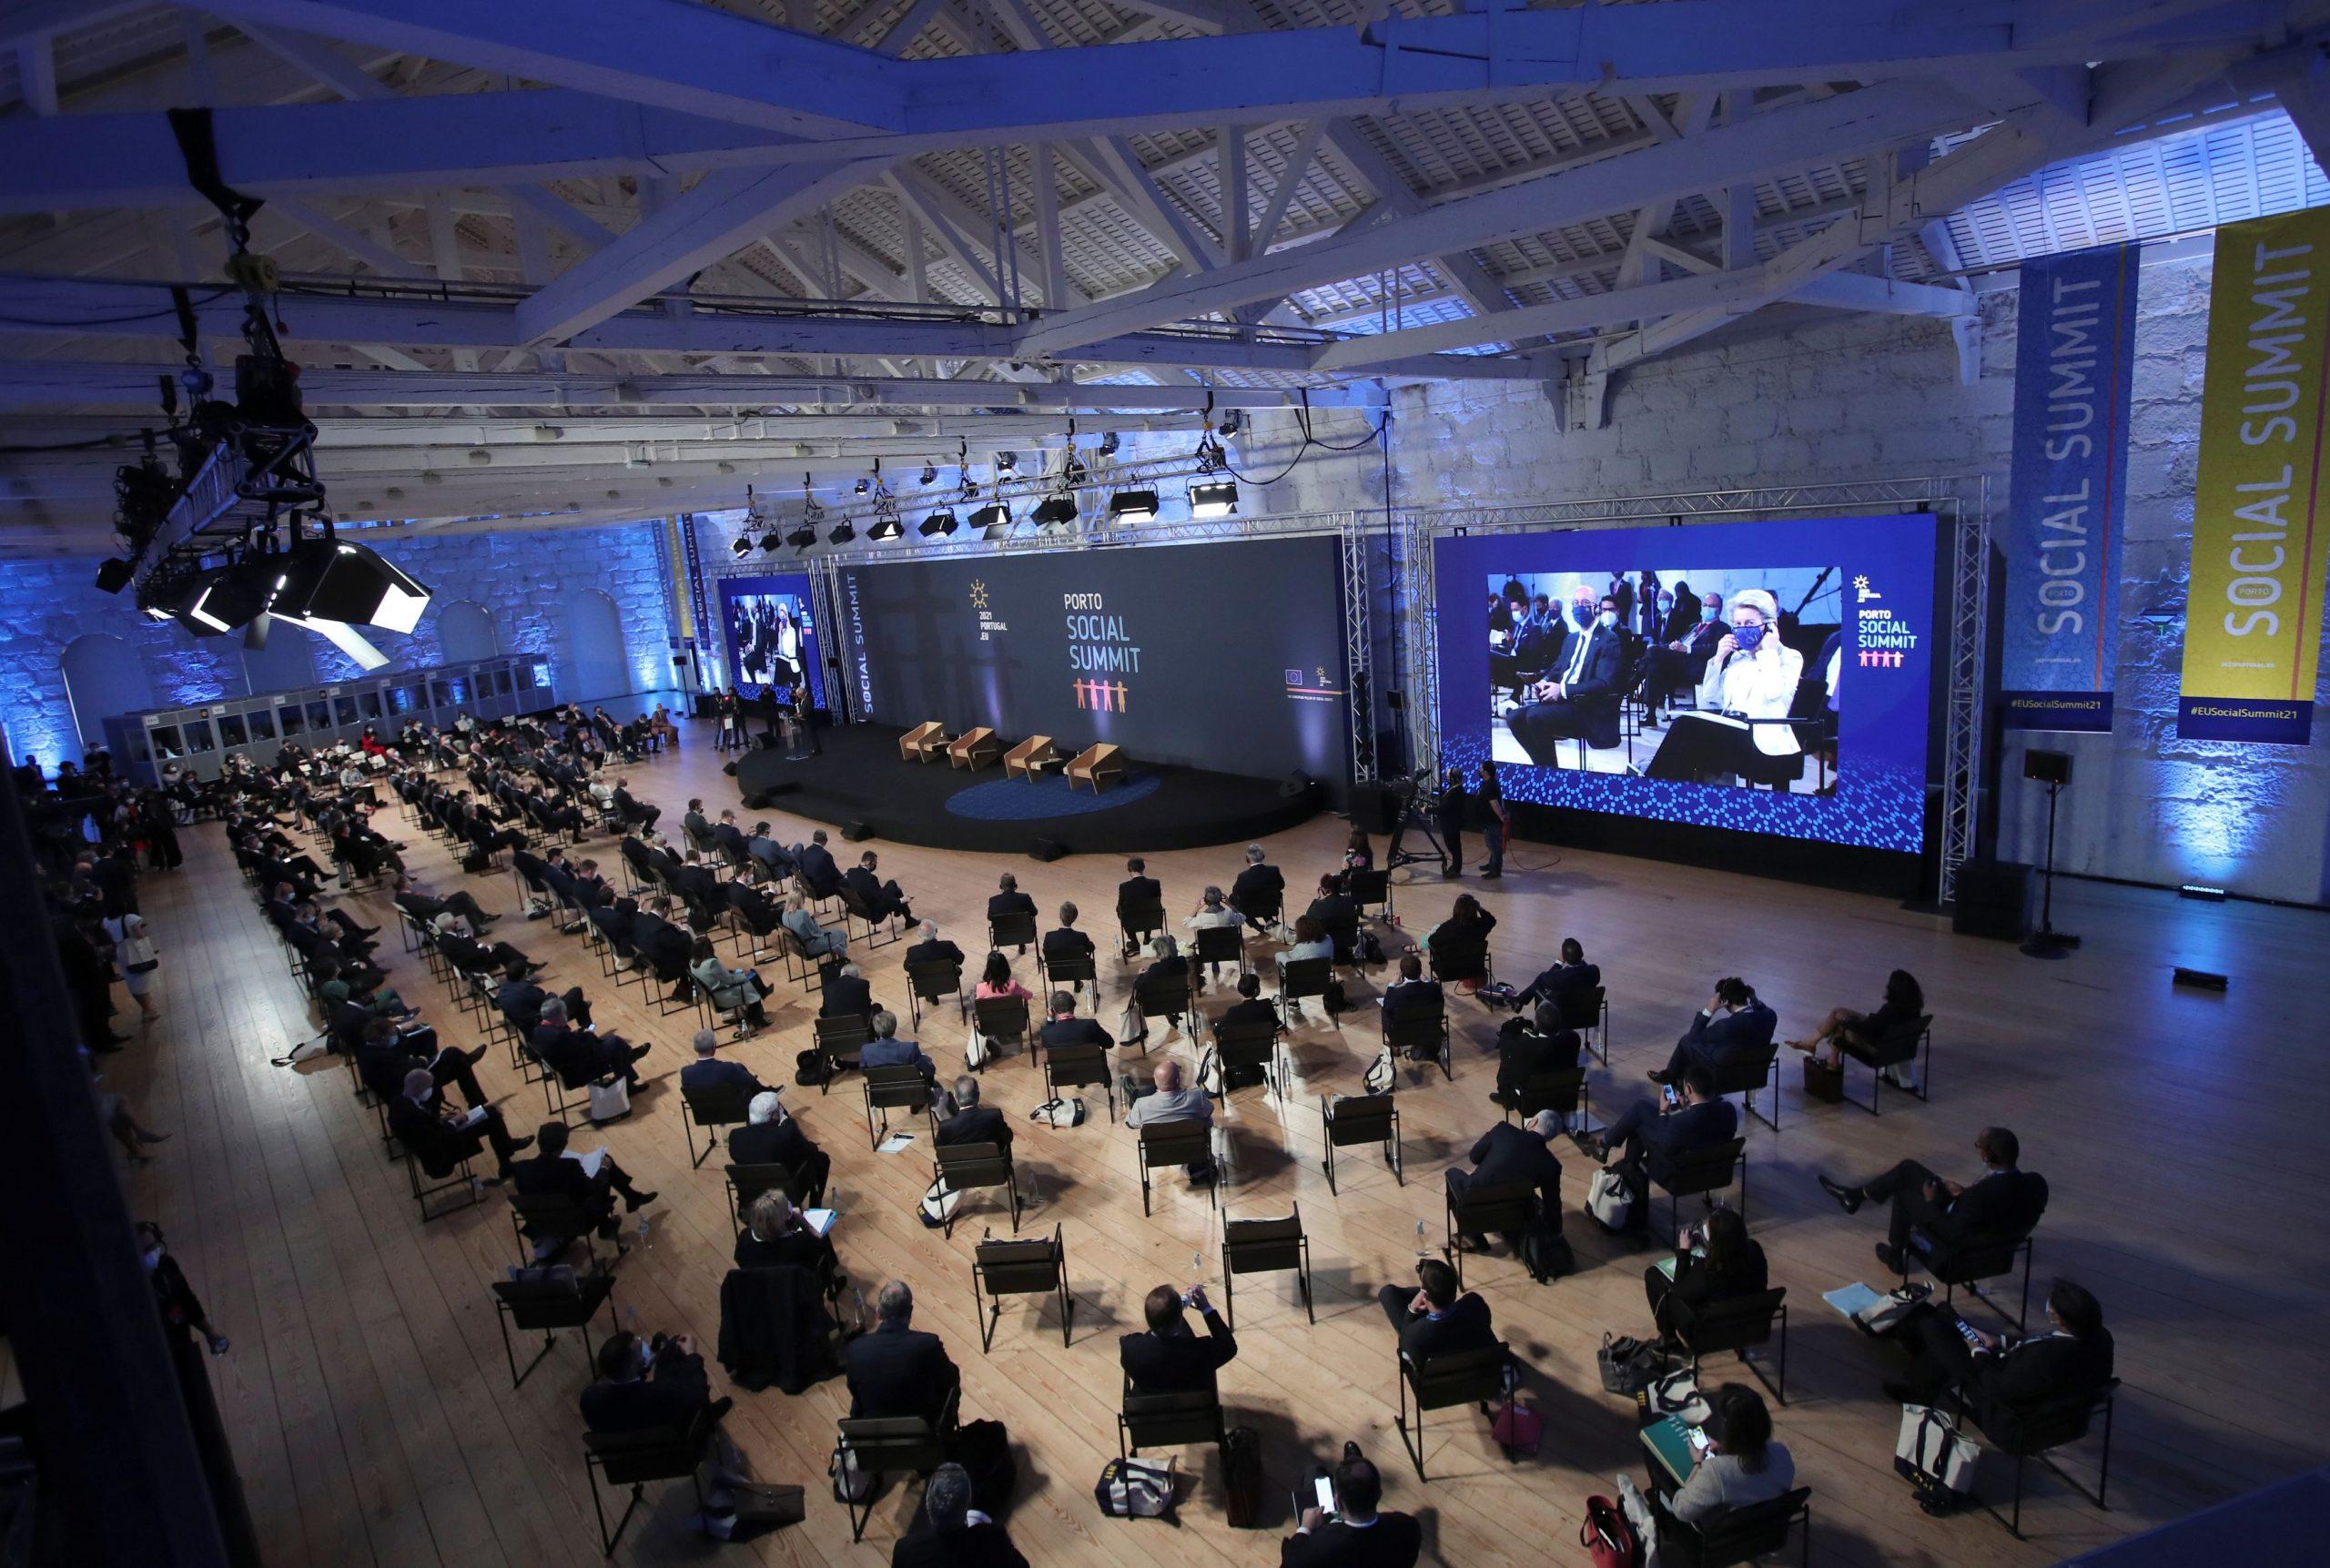 Porto Social Summit 2021: the Porto Social Commitment signed